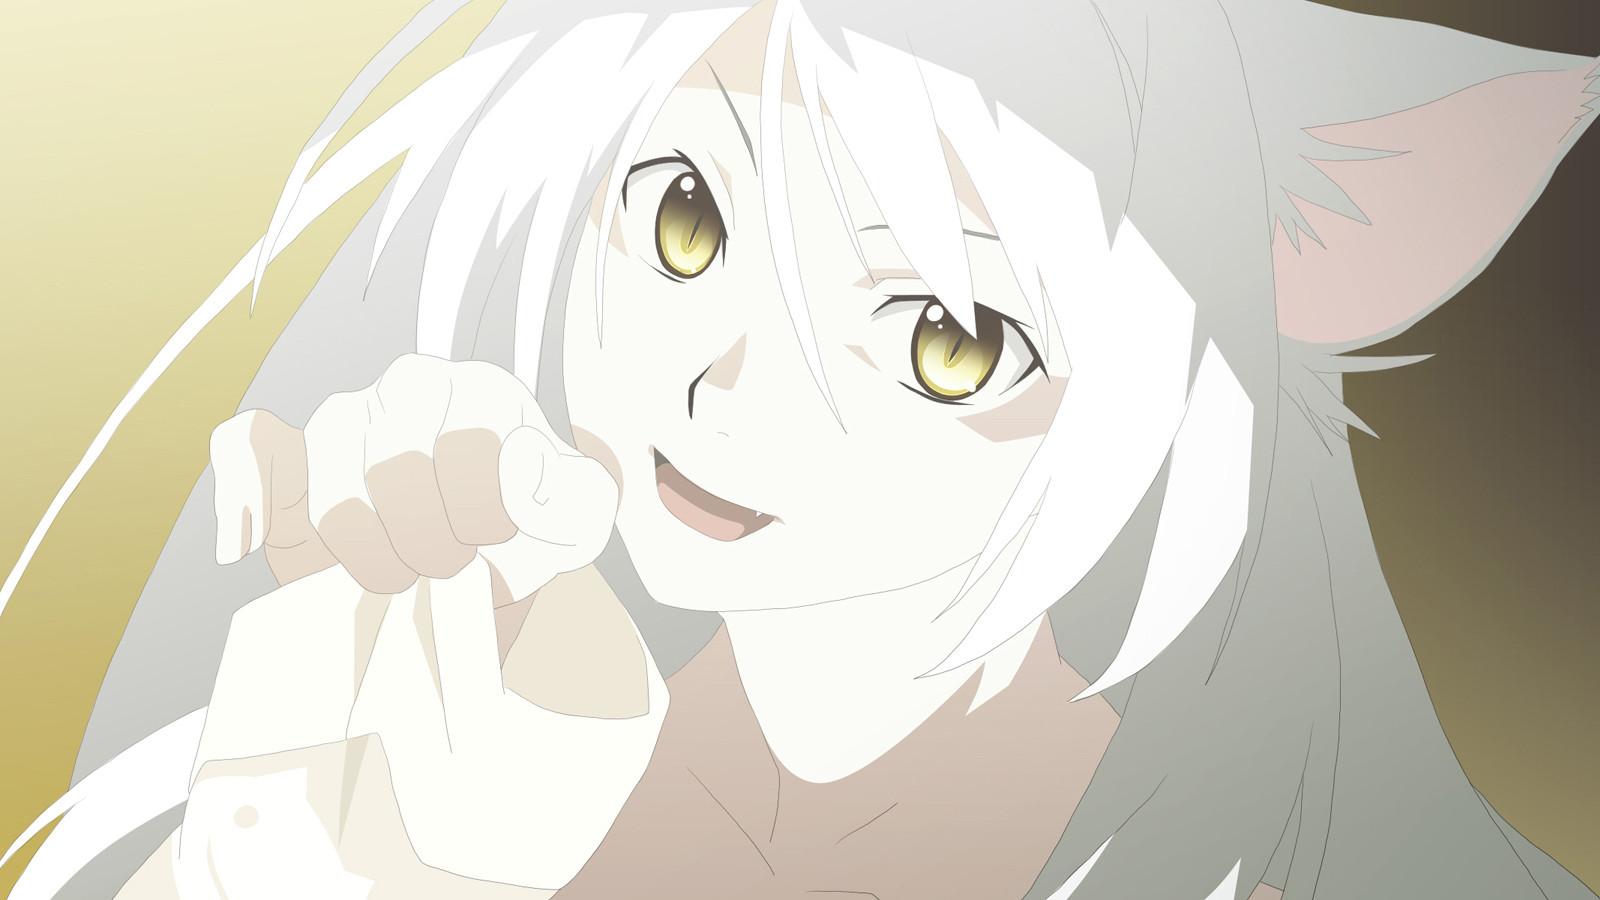 Moe Anime Girl Wallpapers